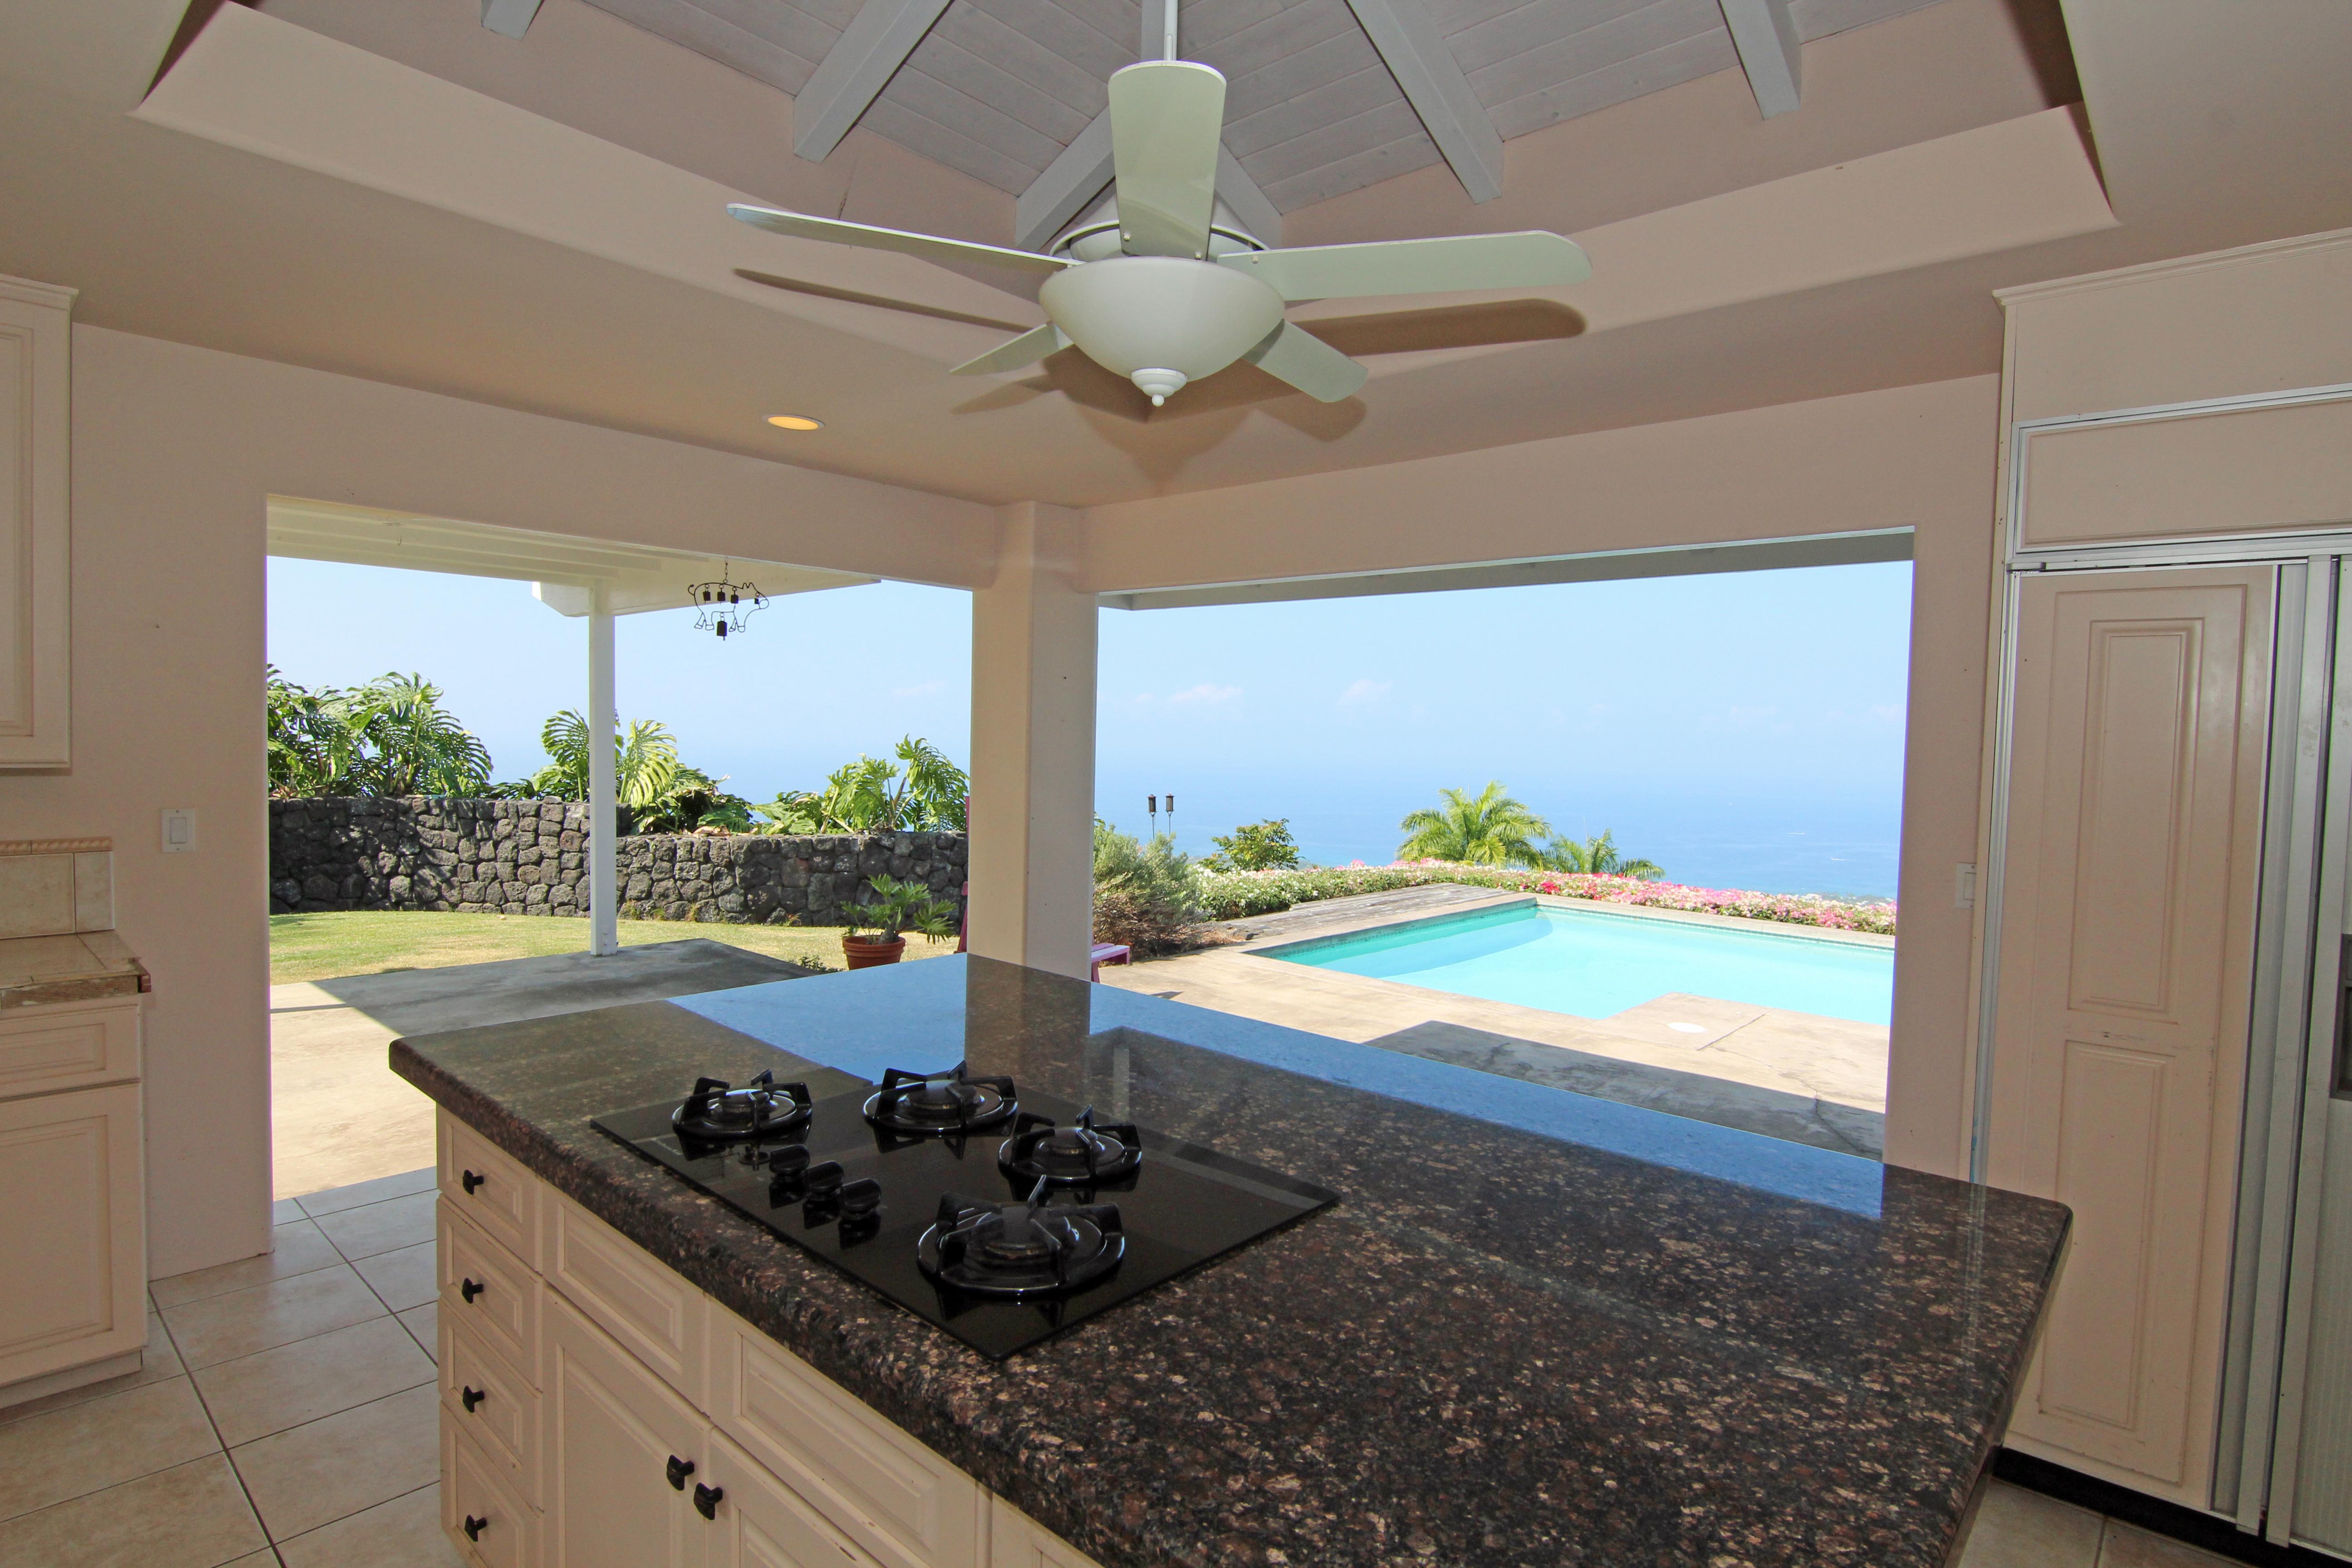 Kona Real Estate For Sale, Kailua Kona Real Estate, Iolani Homes For Sale,